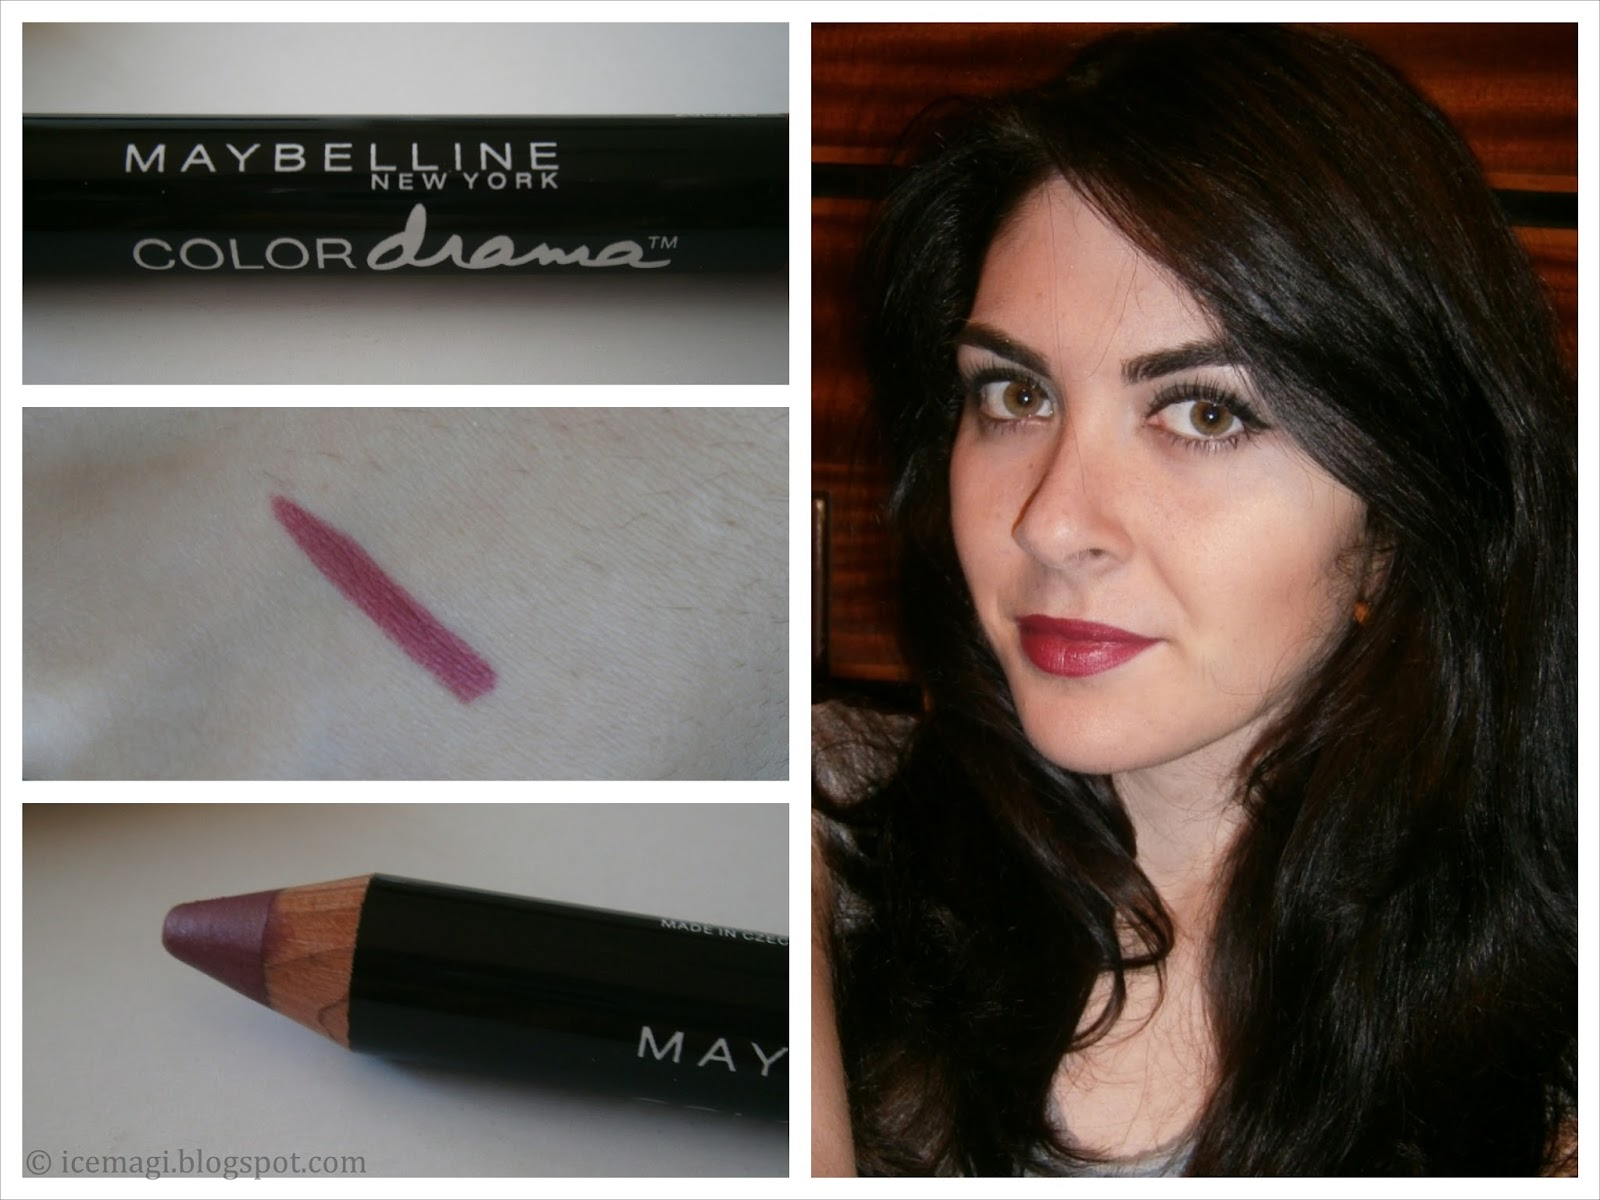 Maybelline Color Drama lip pencil swatch